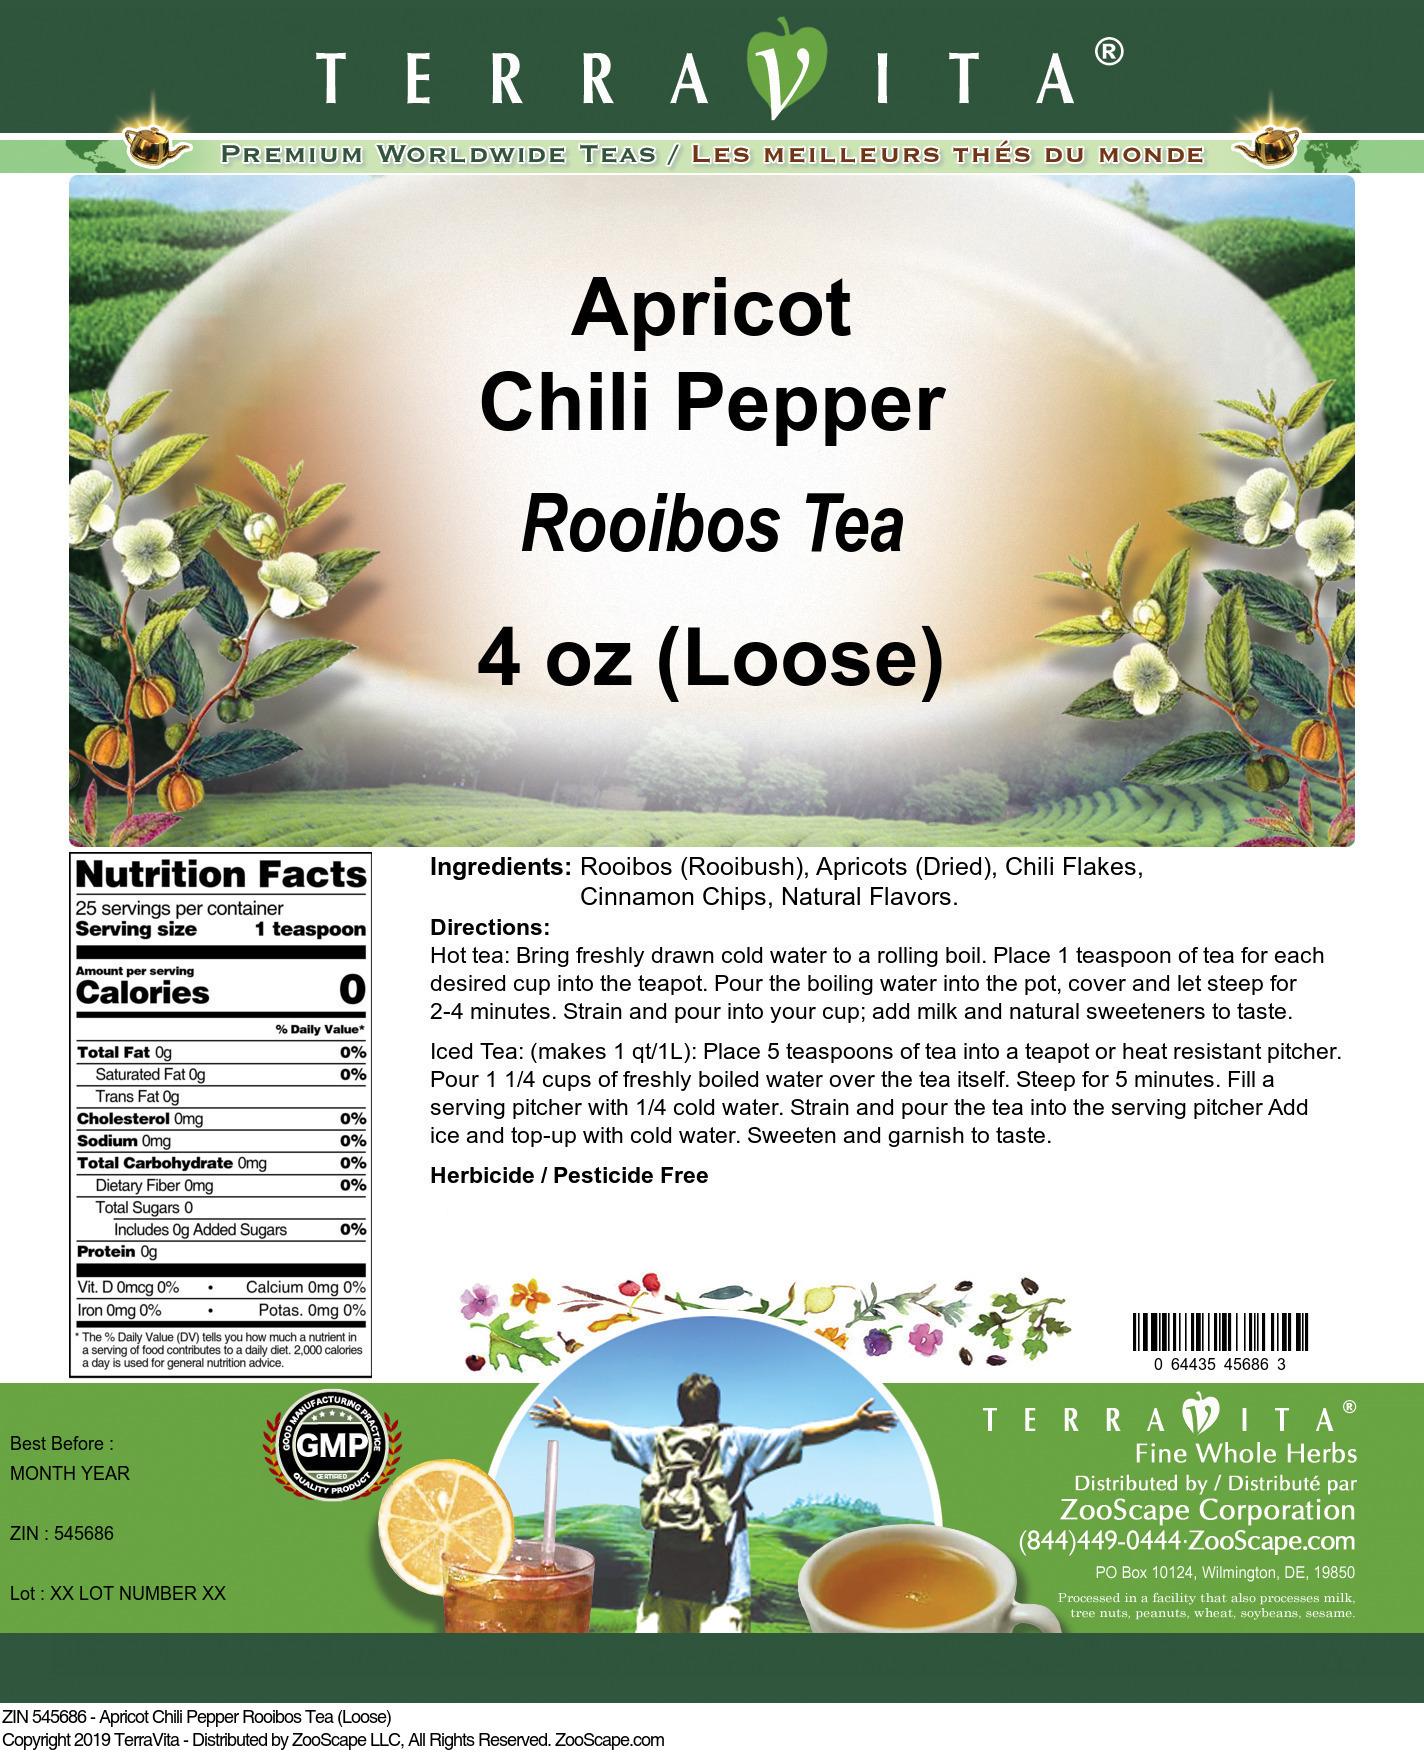 Apricot Chili Pepper Rooibos Tea (Loose)